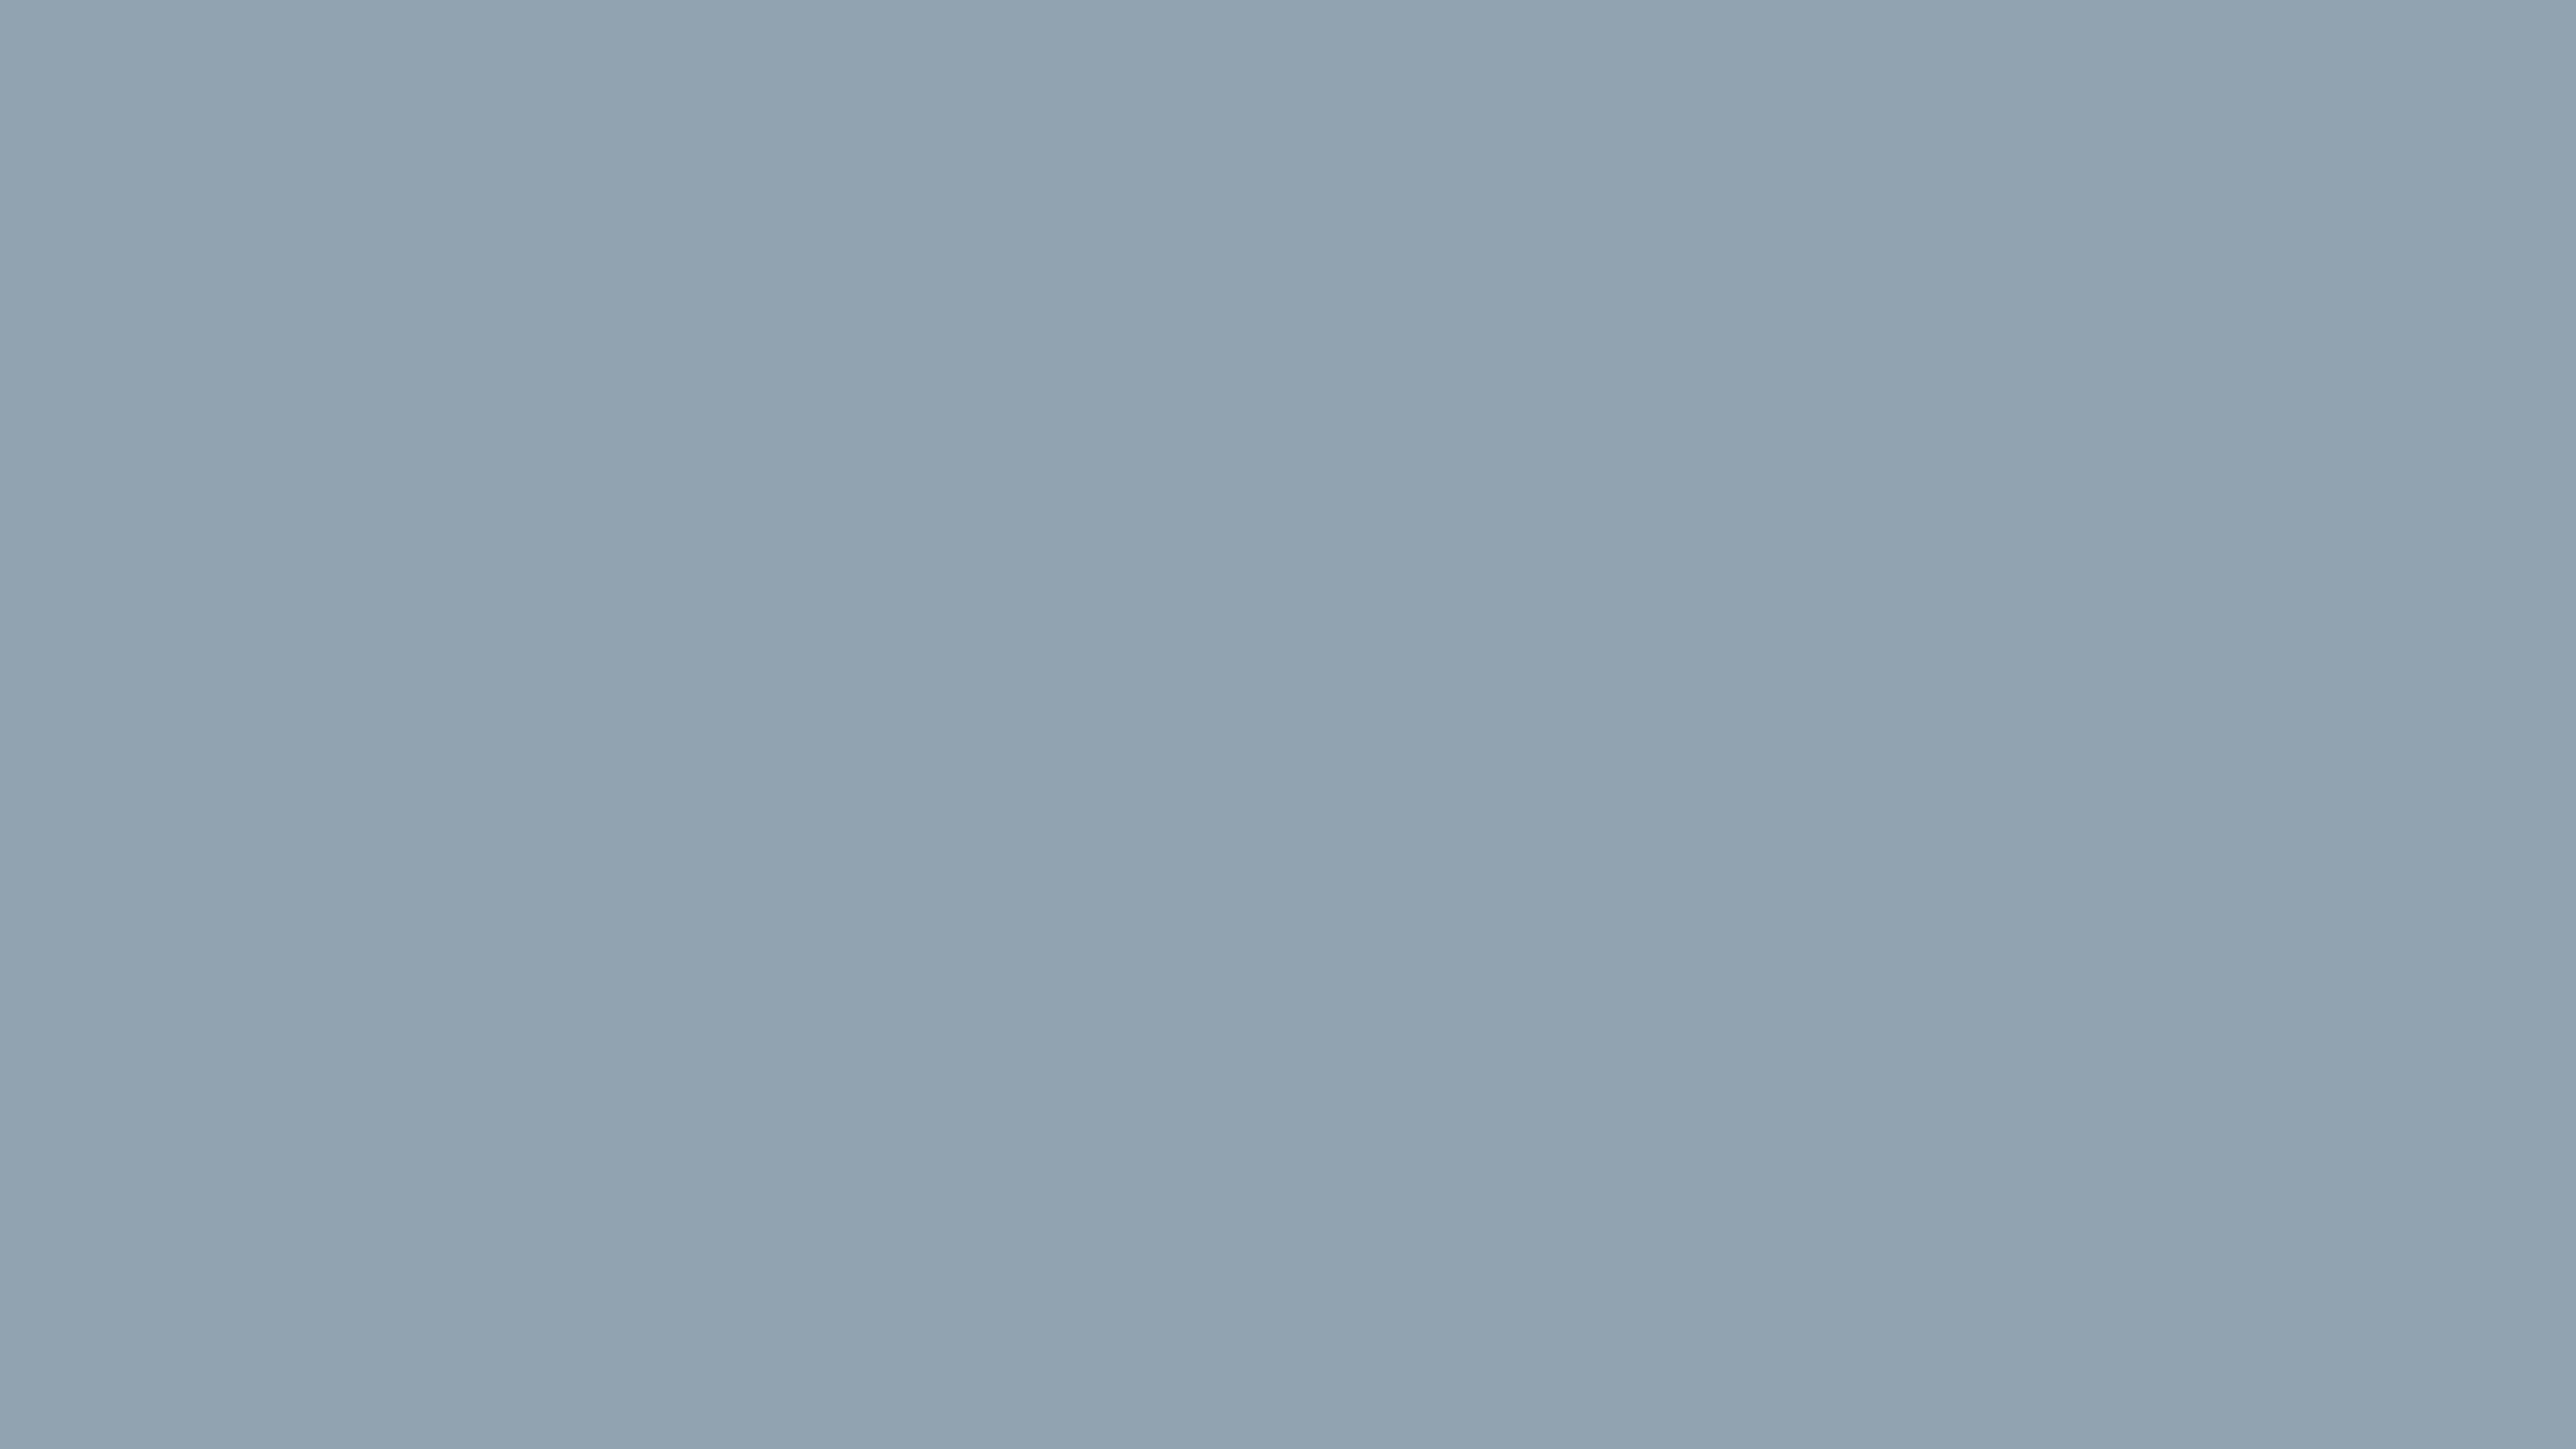 3840x2160 Cadet Grey Solid Color Background